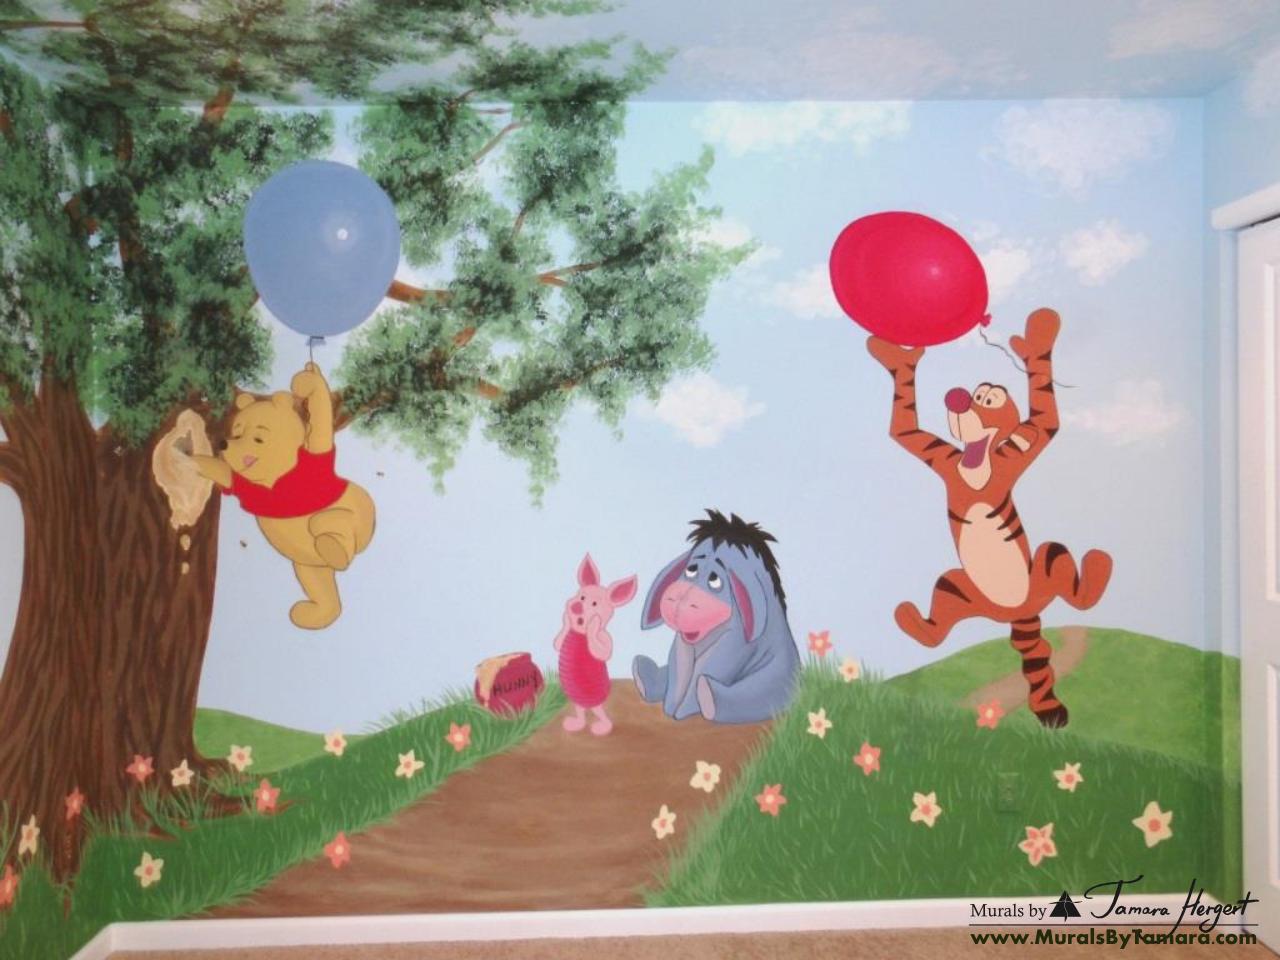 Winnie the Pooh mural Winnie, Piglet and Tigger full view - kids room mural by Tamara Hergert